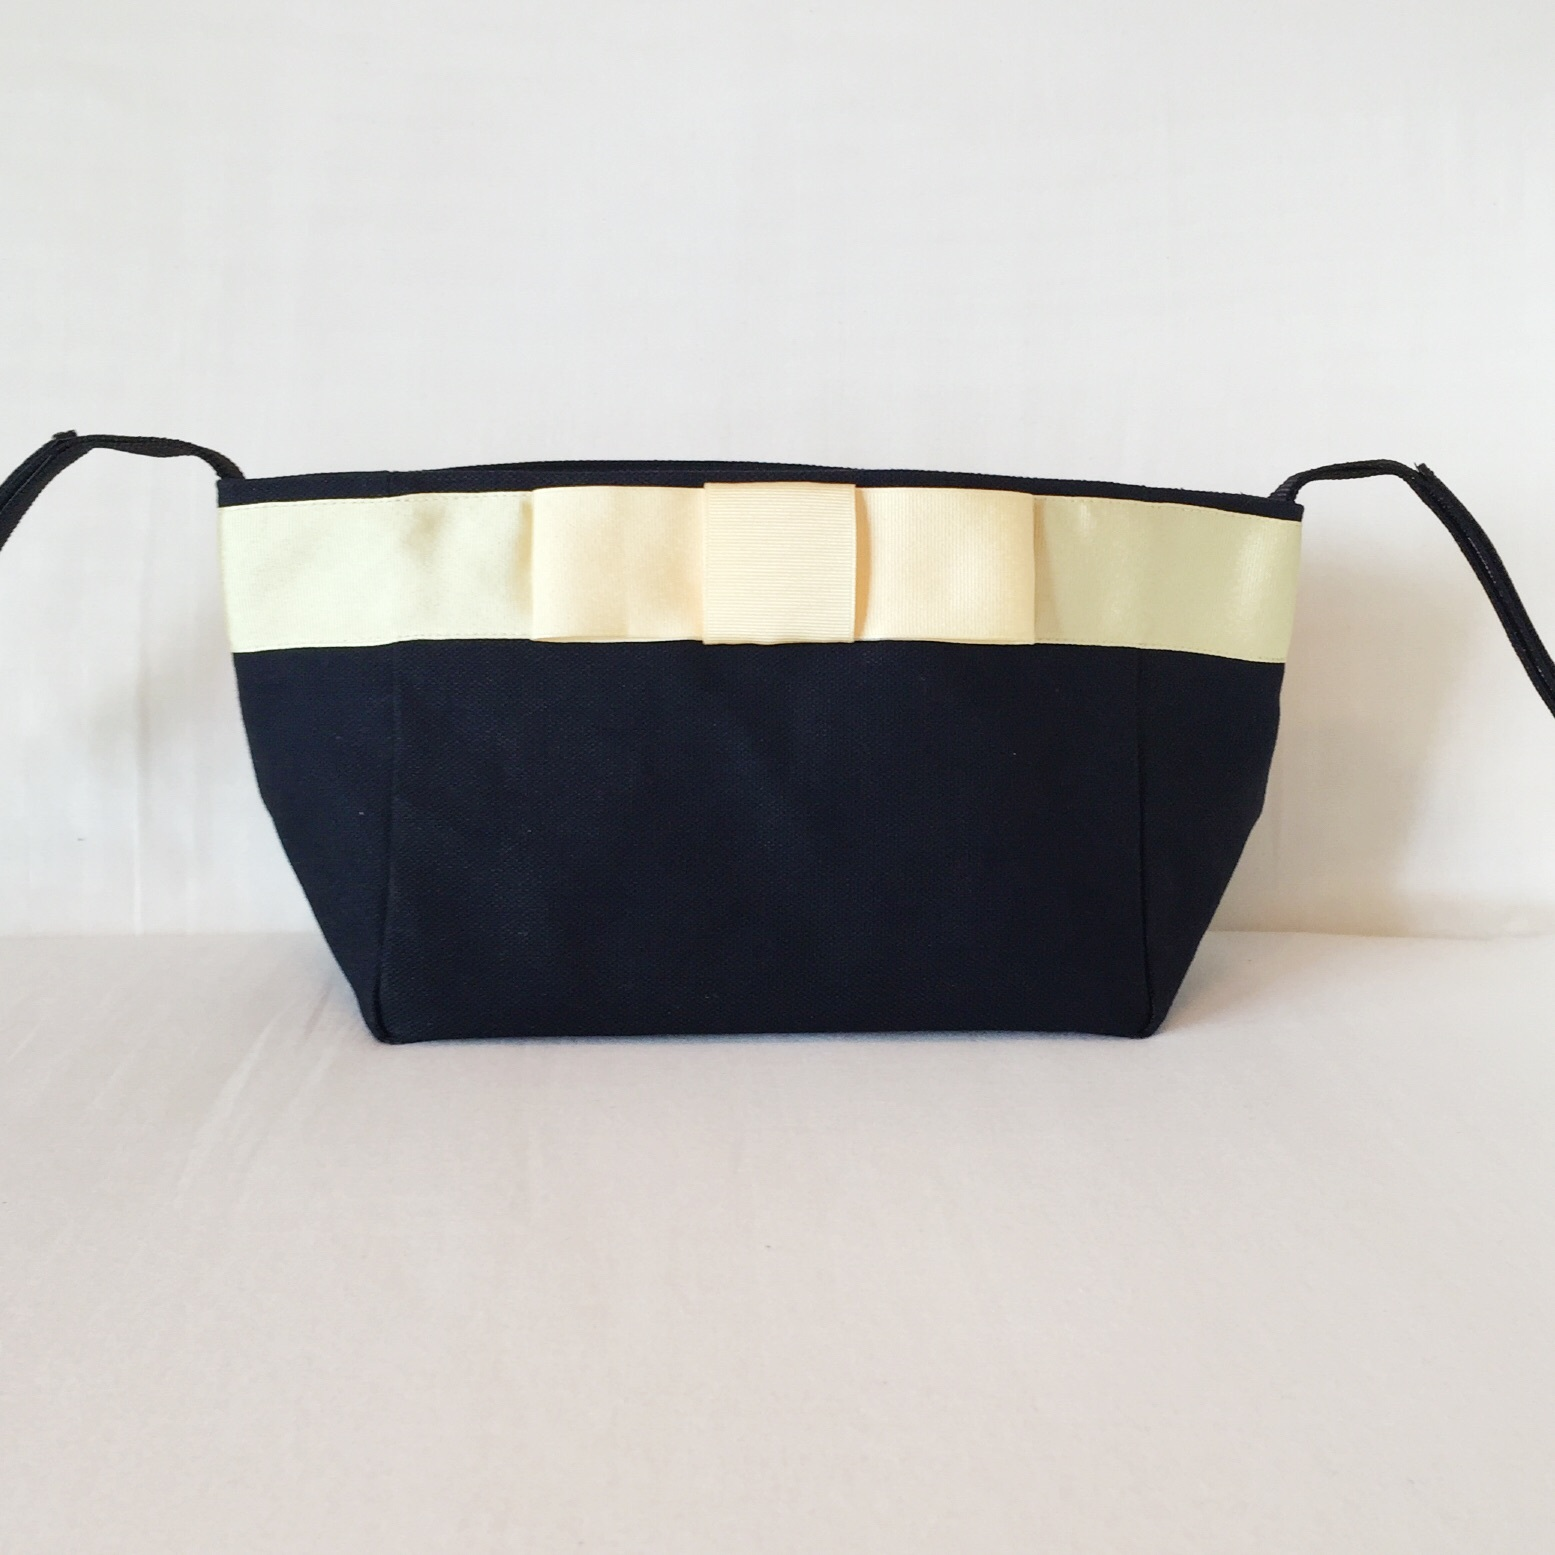 Buggy bag *ブラック